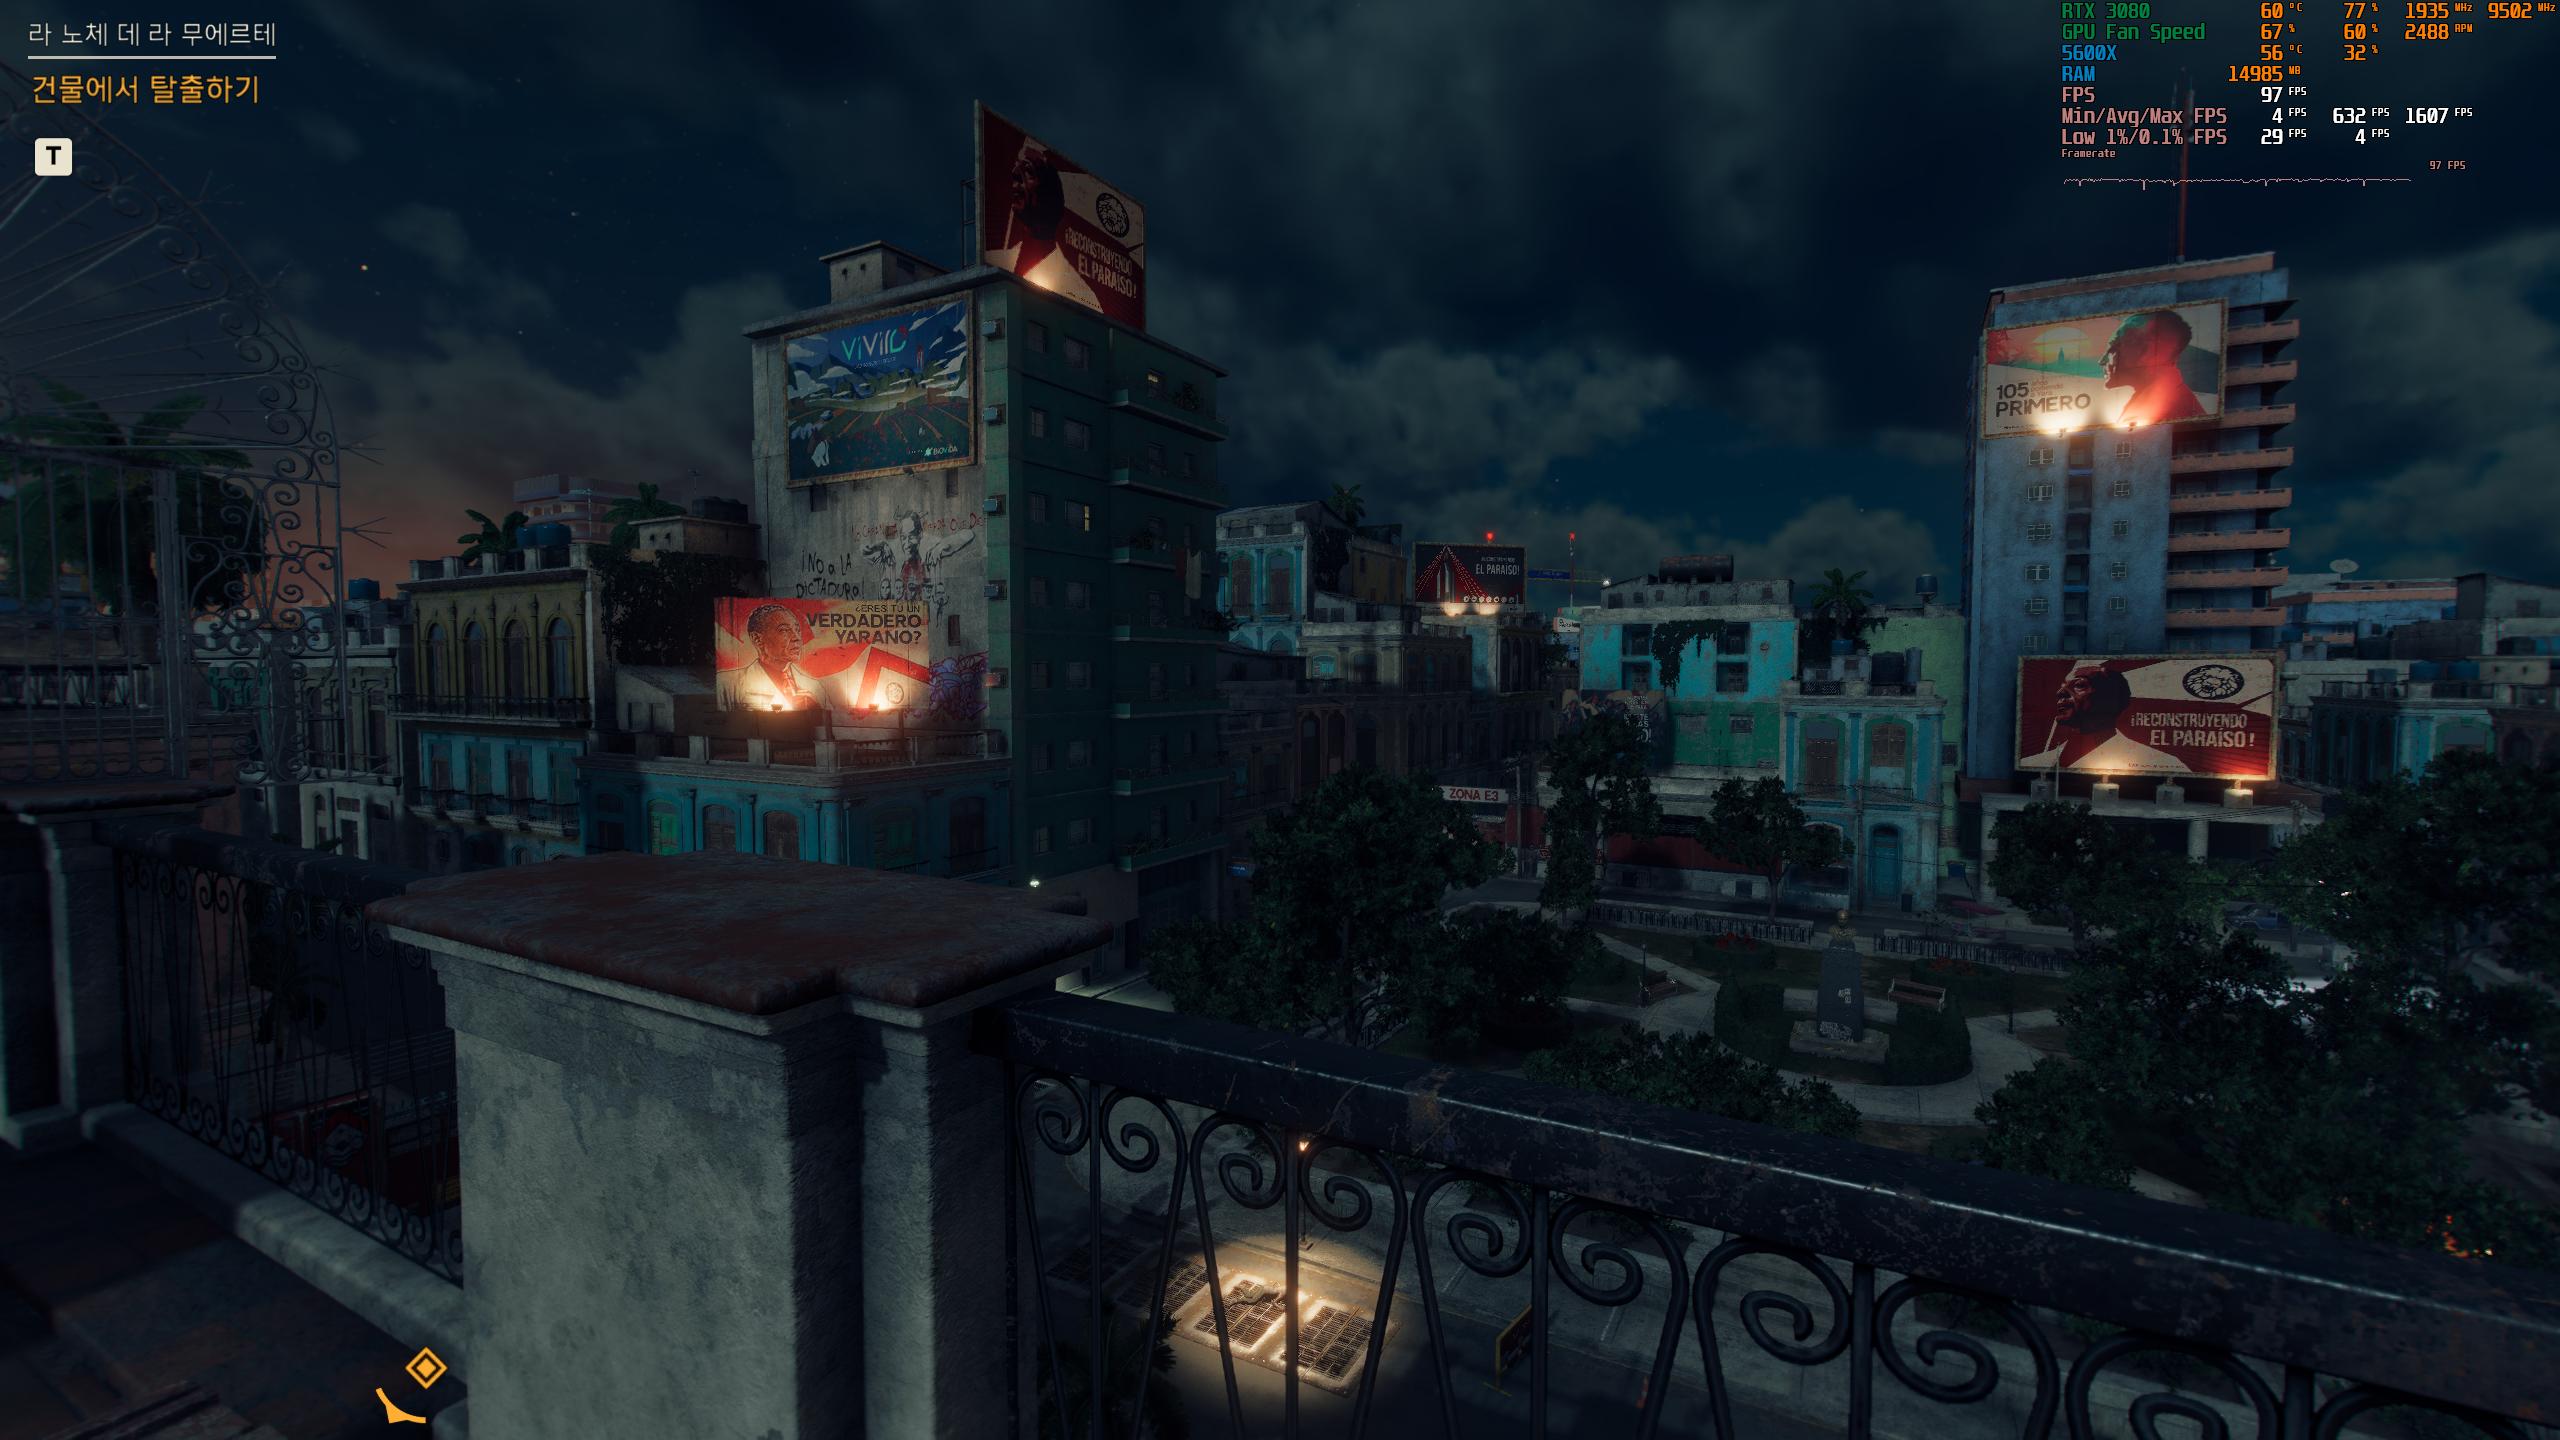 Far Cry 6 Screenshot 2021.10.11 - 00.23.18.33.png